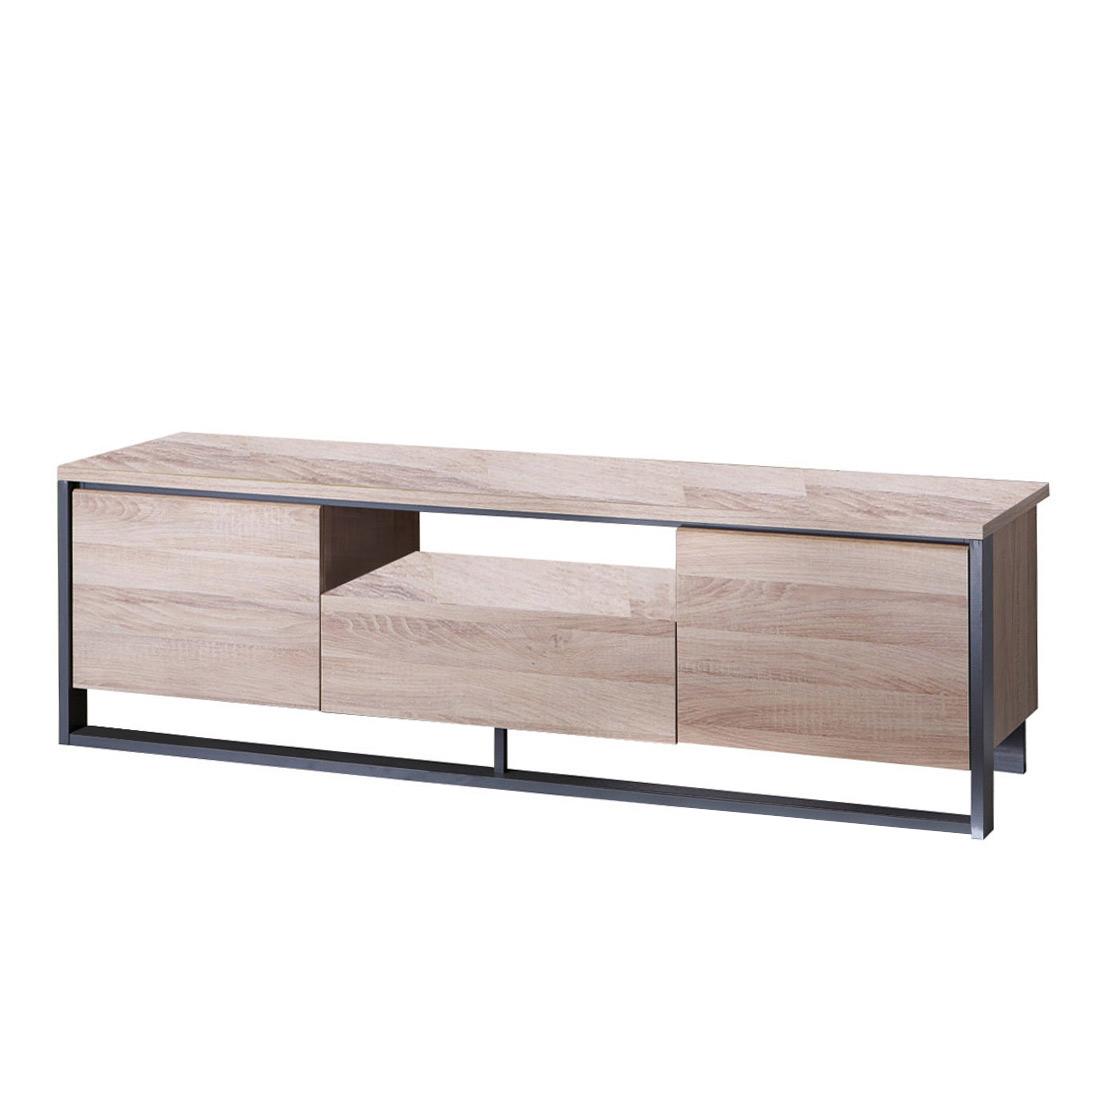 lowboard sideboard cool cosmo lowboard sideboards. Black Bedroom Furniture Sets. Home Design Ideas